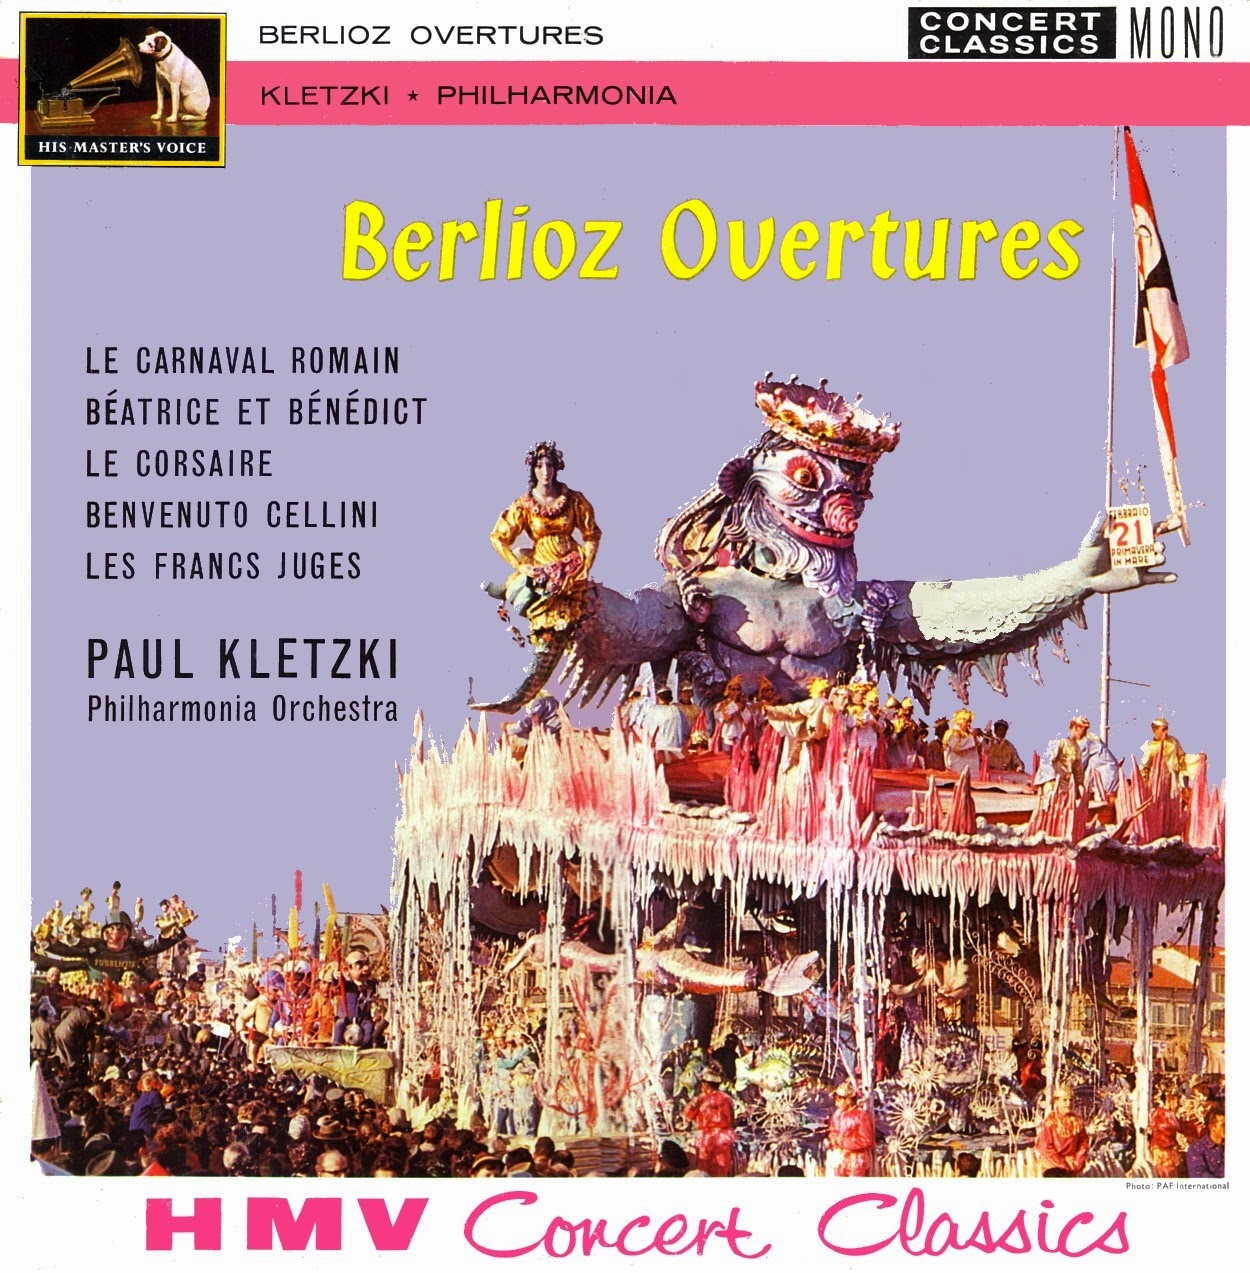 Quizz Pochettes, pour discophiles - Page 7 Kletzki%2B-%2BBerlioz%2B-%2BXLP